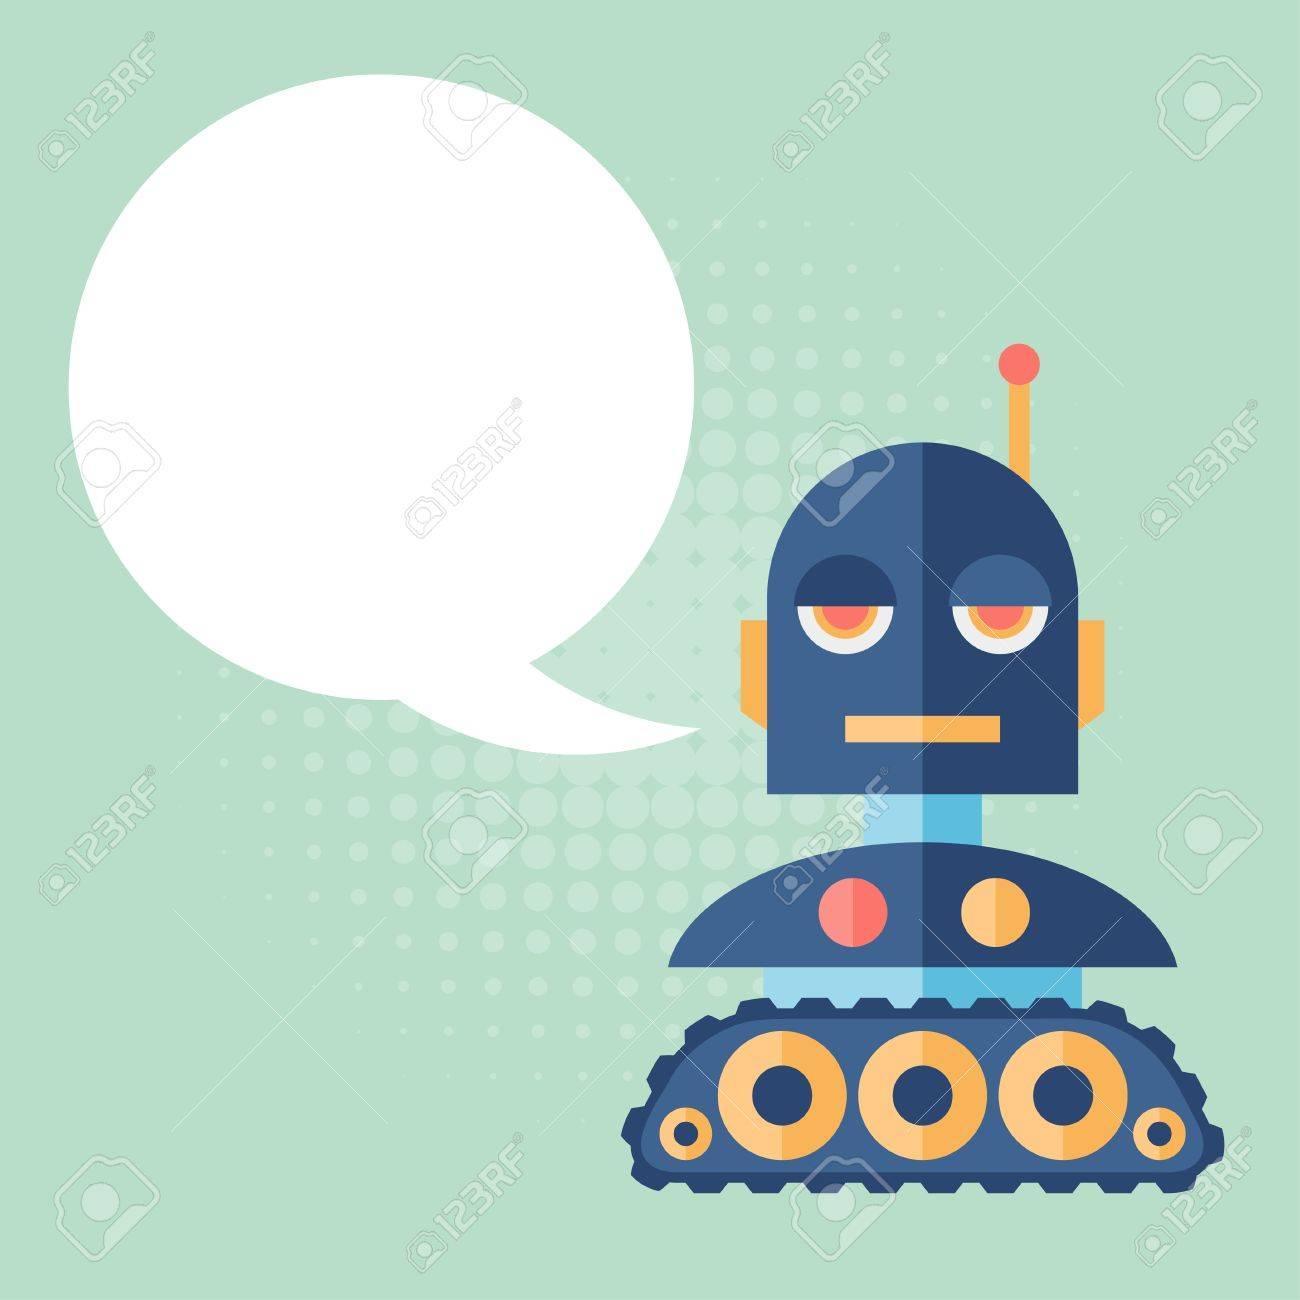 Design robot says something. Stock Vector - 26589516